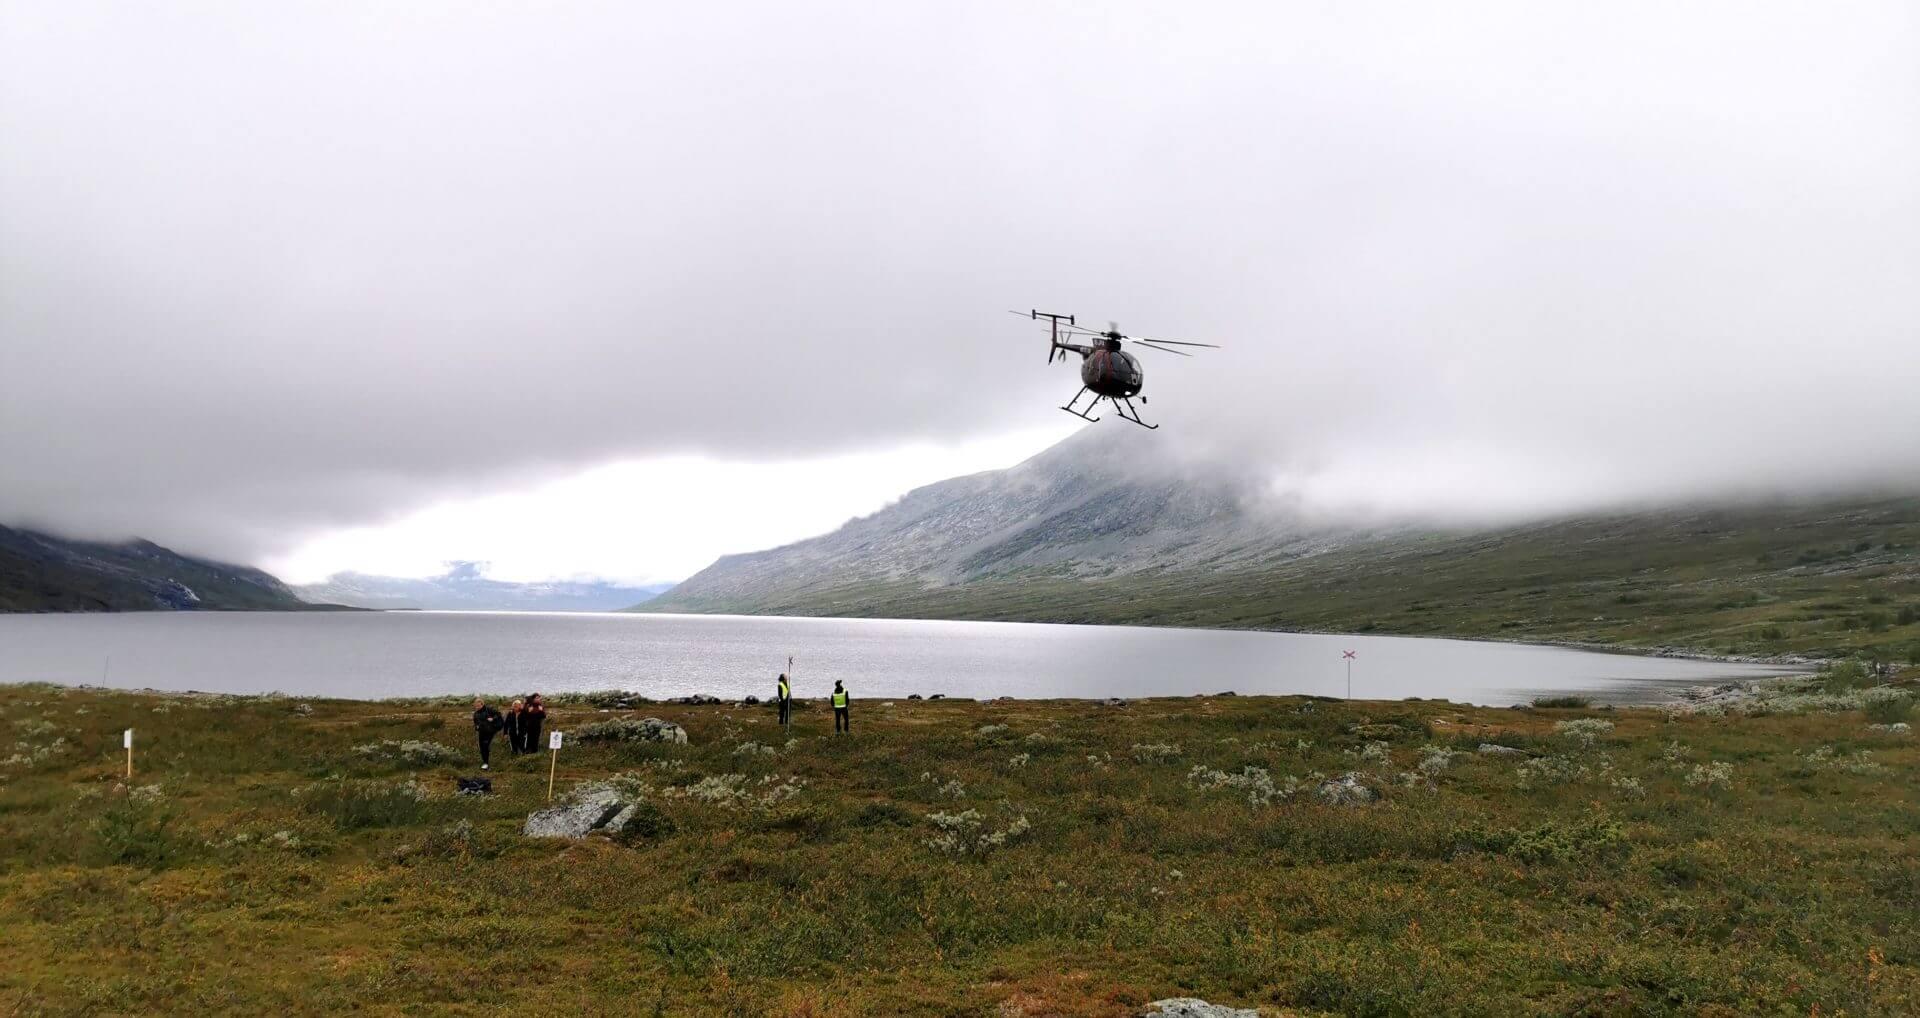 Arctic Circle Race 2019 Guijaure Polcirkeln heli2